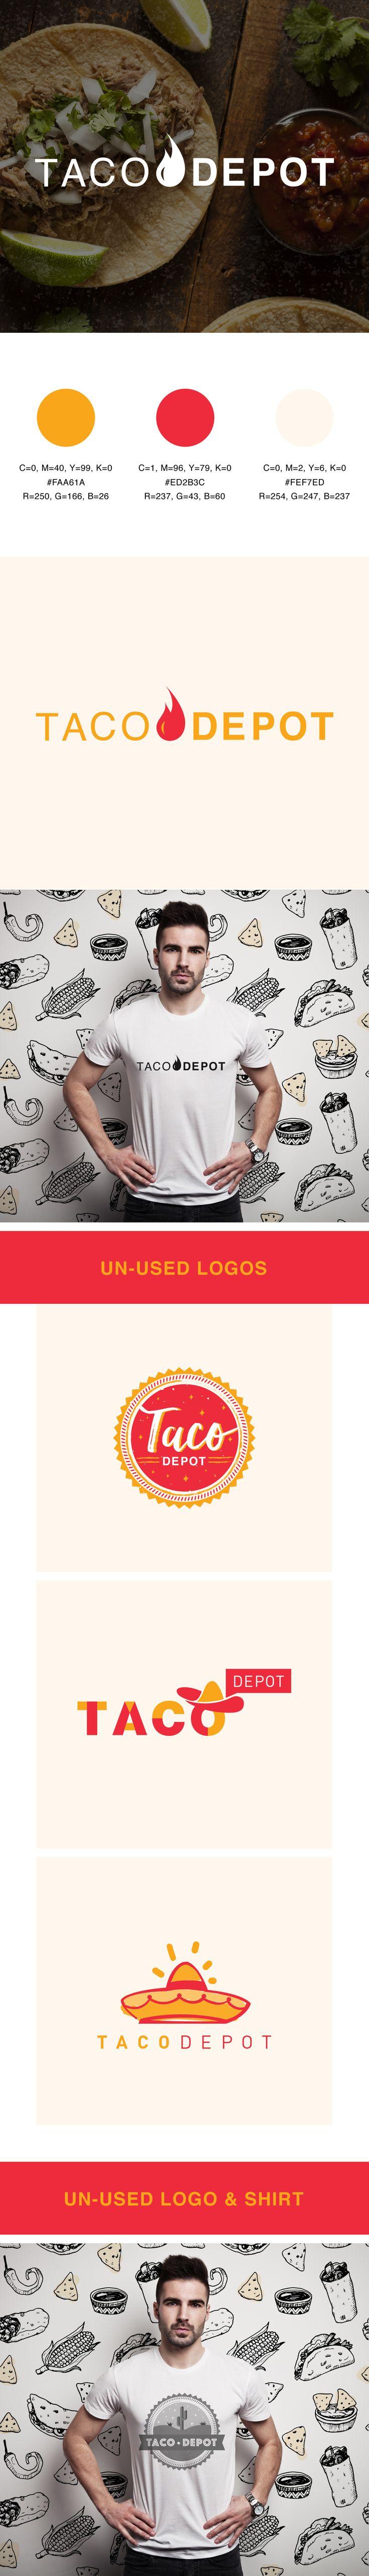 Taco Chata Branding on Behance